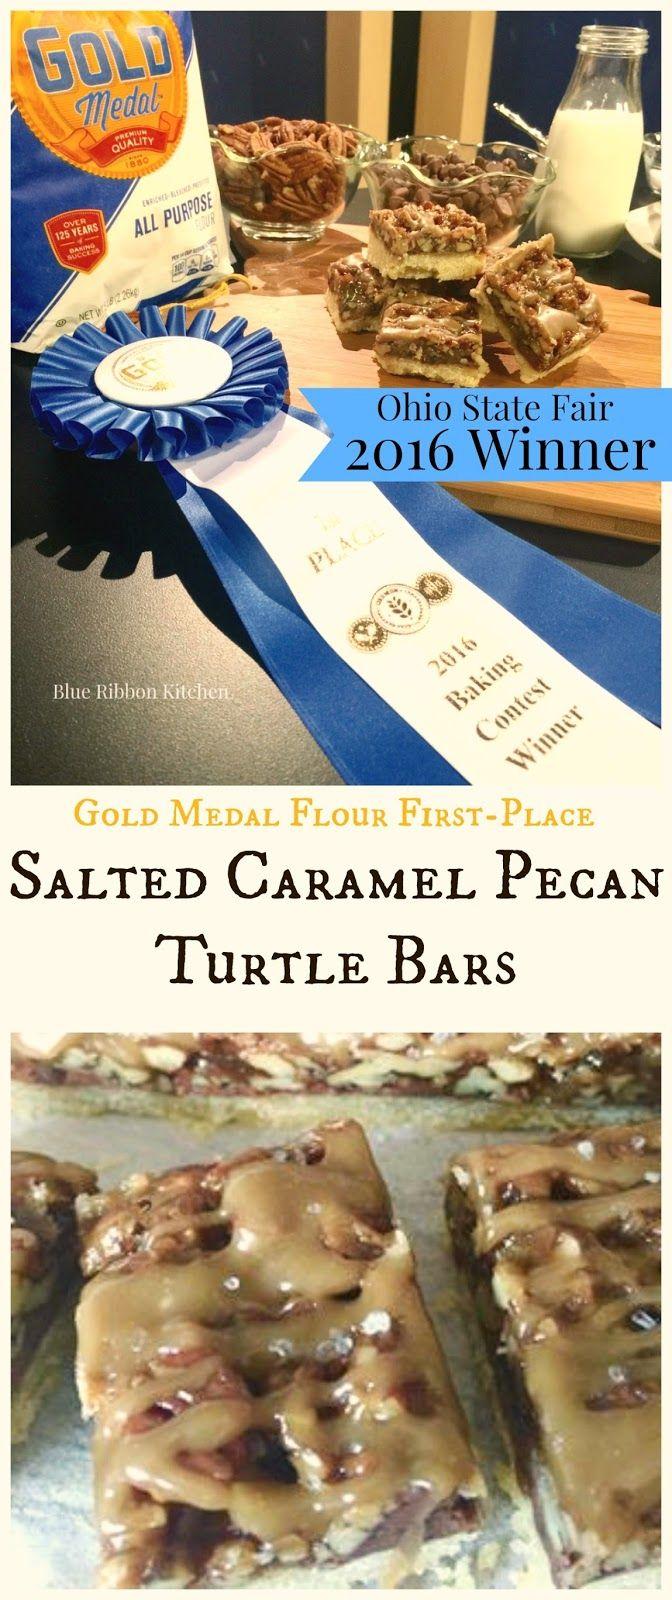 Blue Ribbon Kitchen: Please Meet The Newest Award-Winning Cookie: Salted Caramel Pecan Turtle Bars